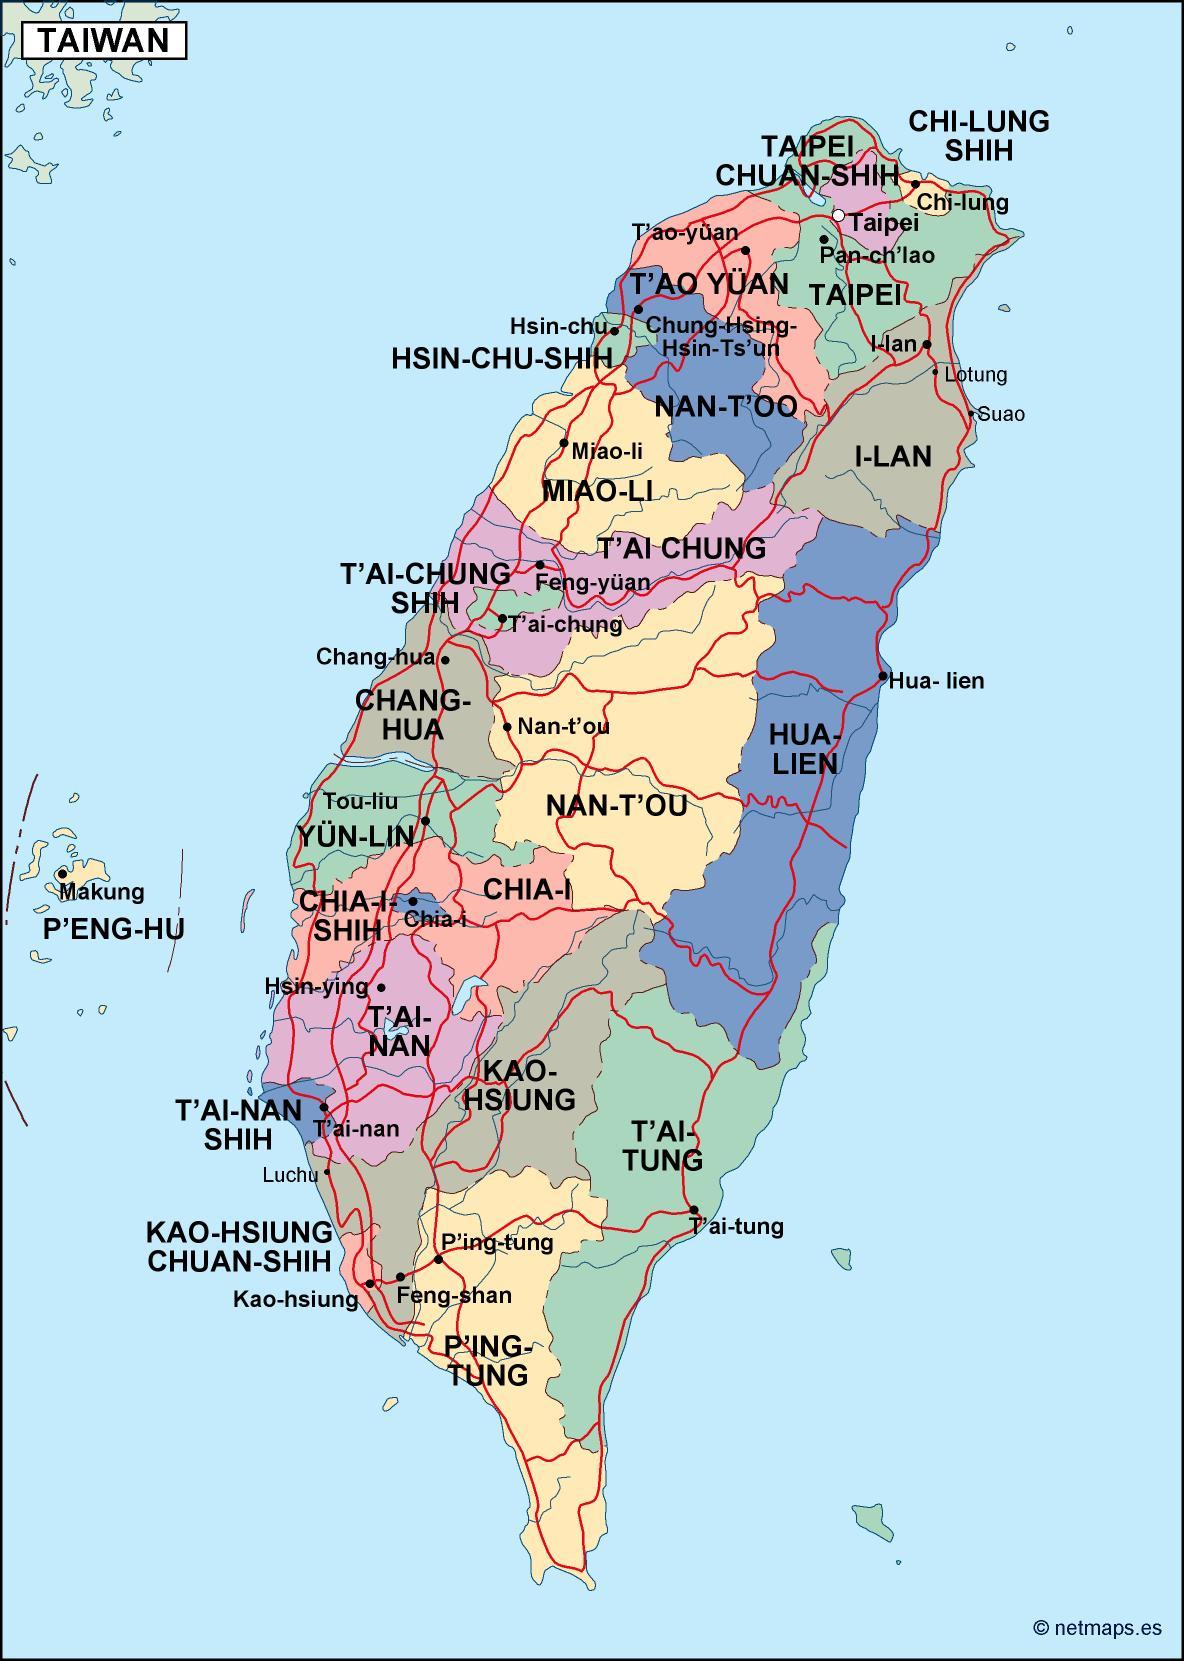 Taiwan Political Map Eps Illustrator